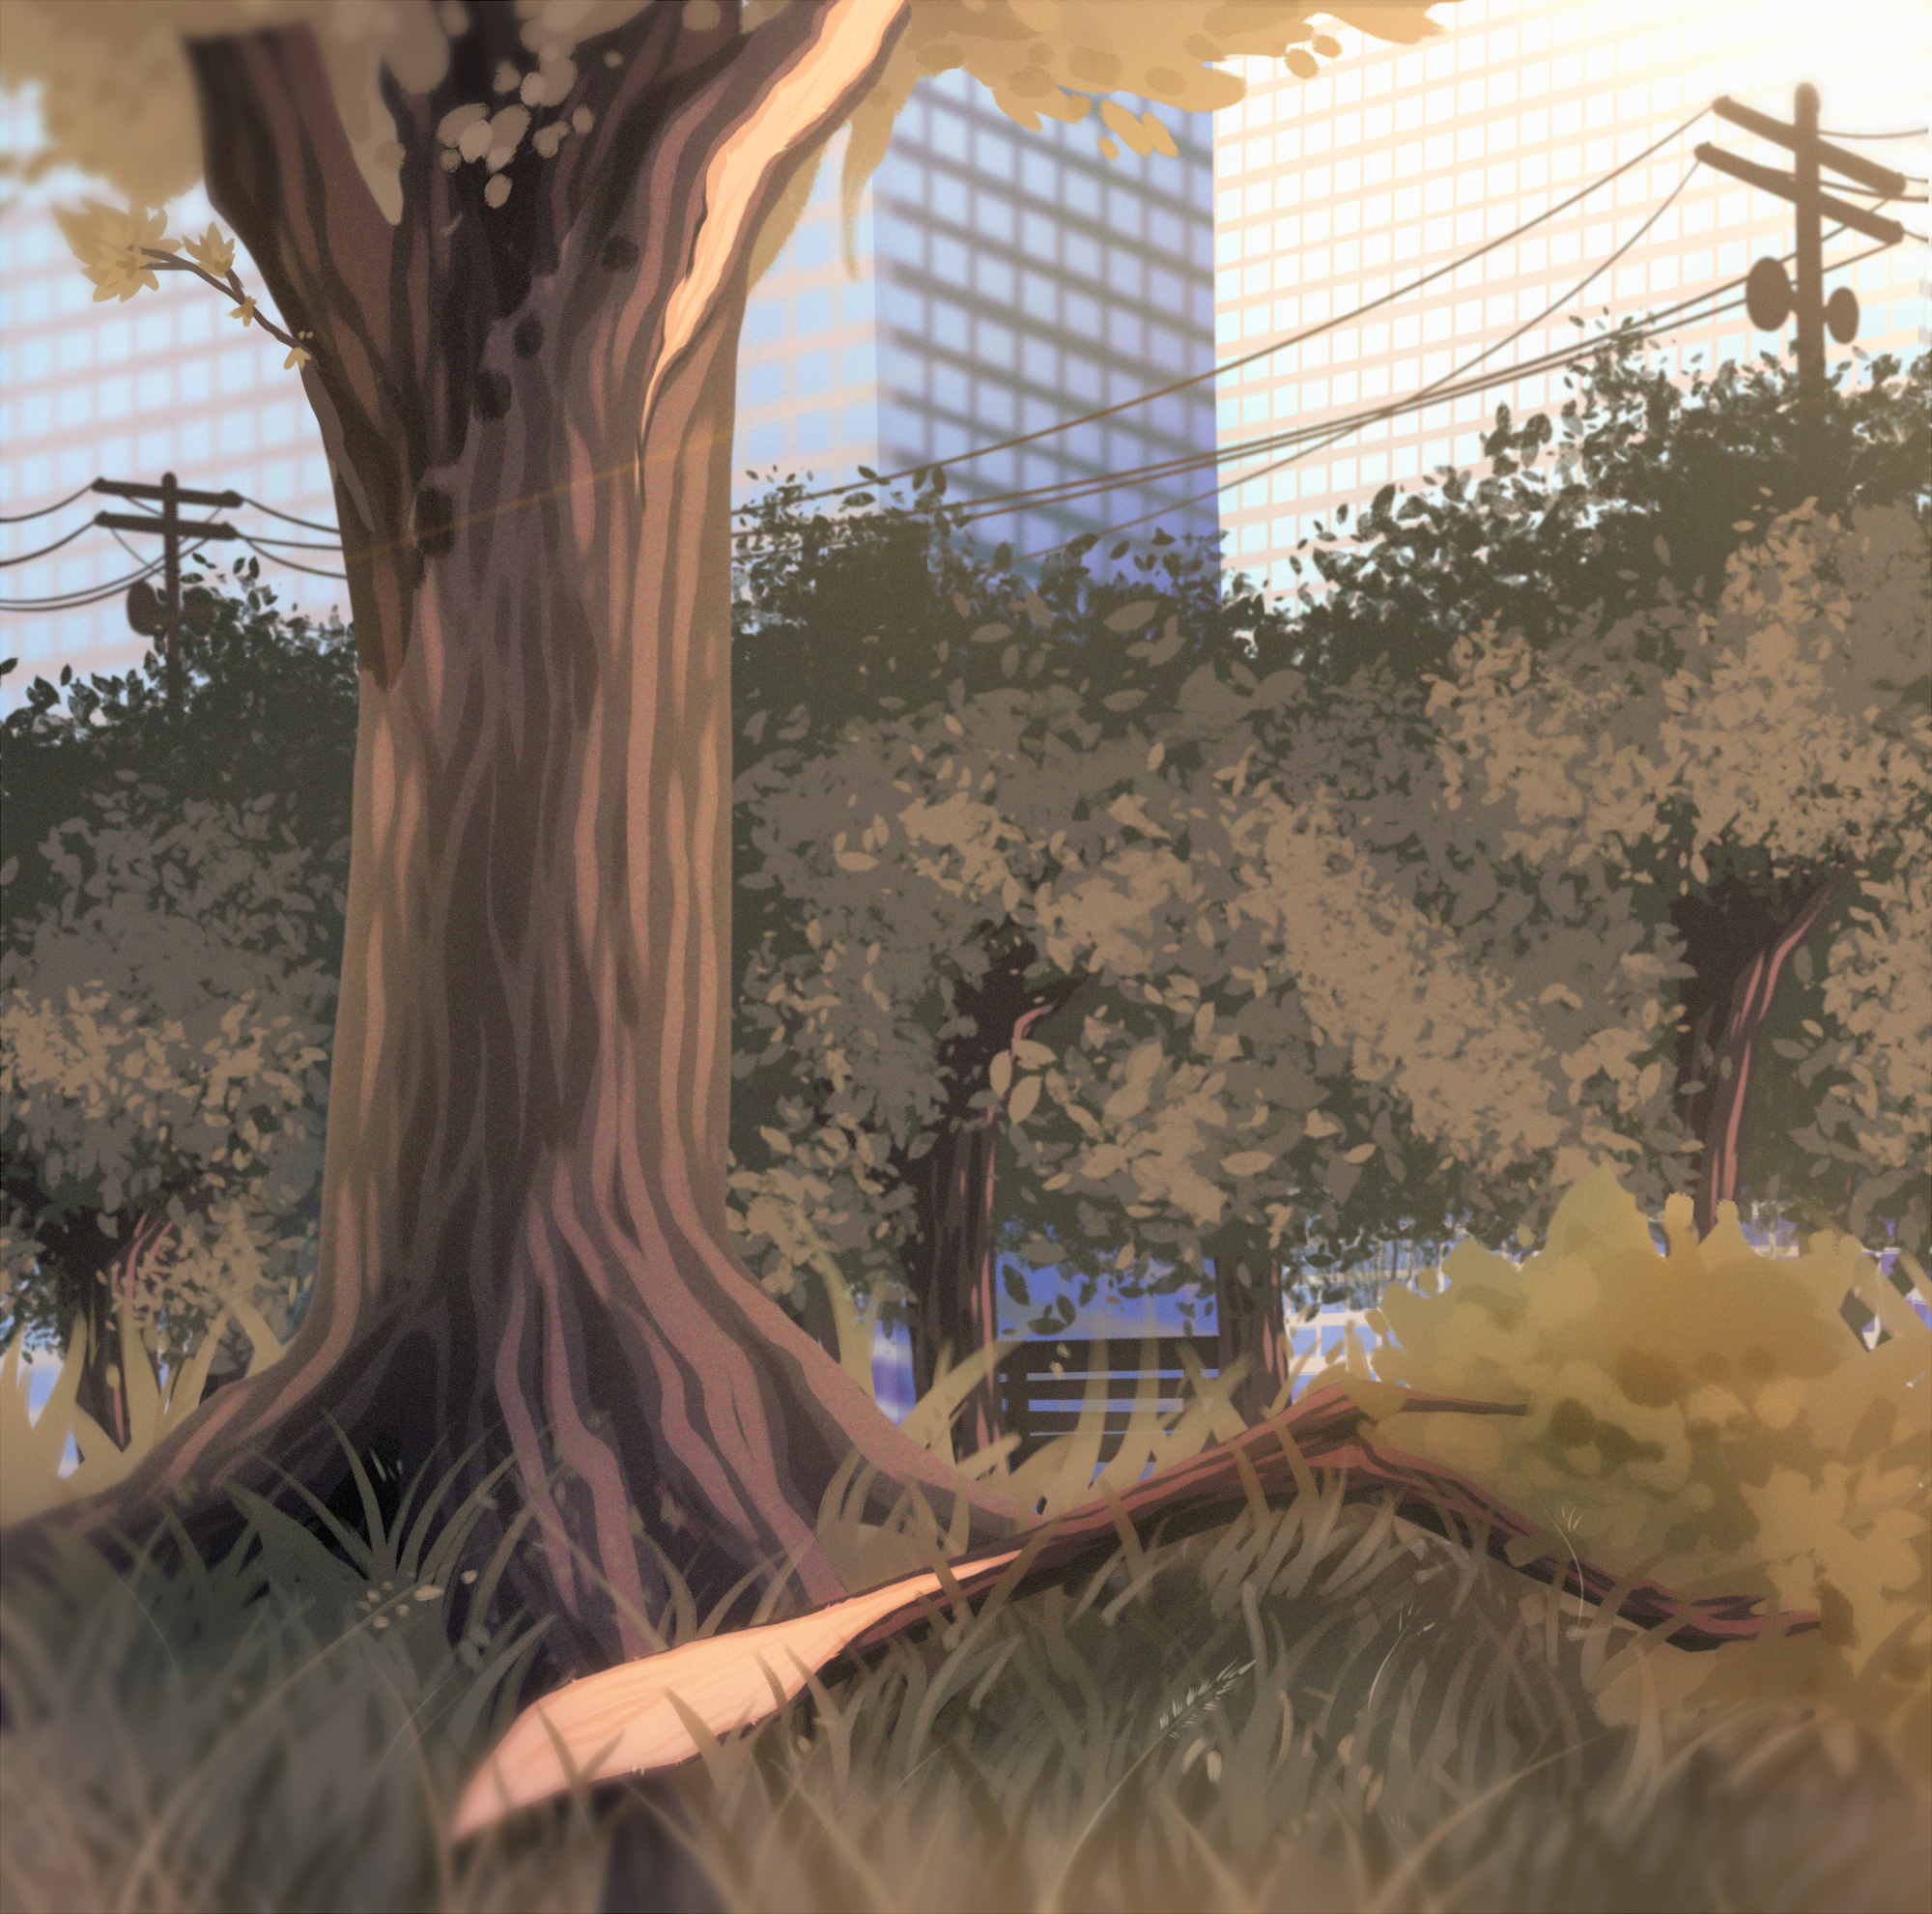 Dead trees do talk